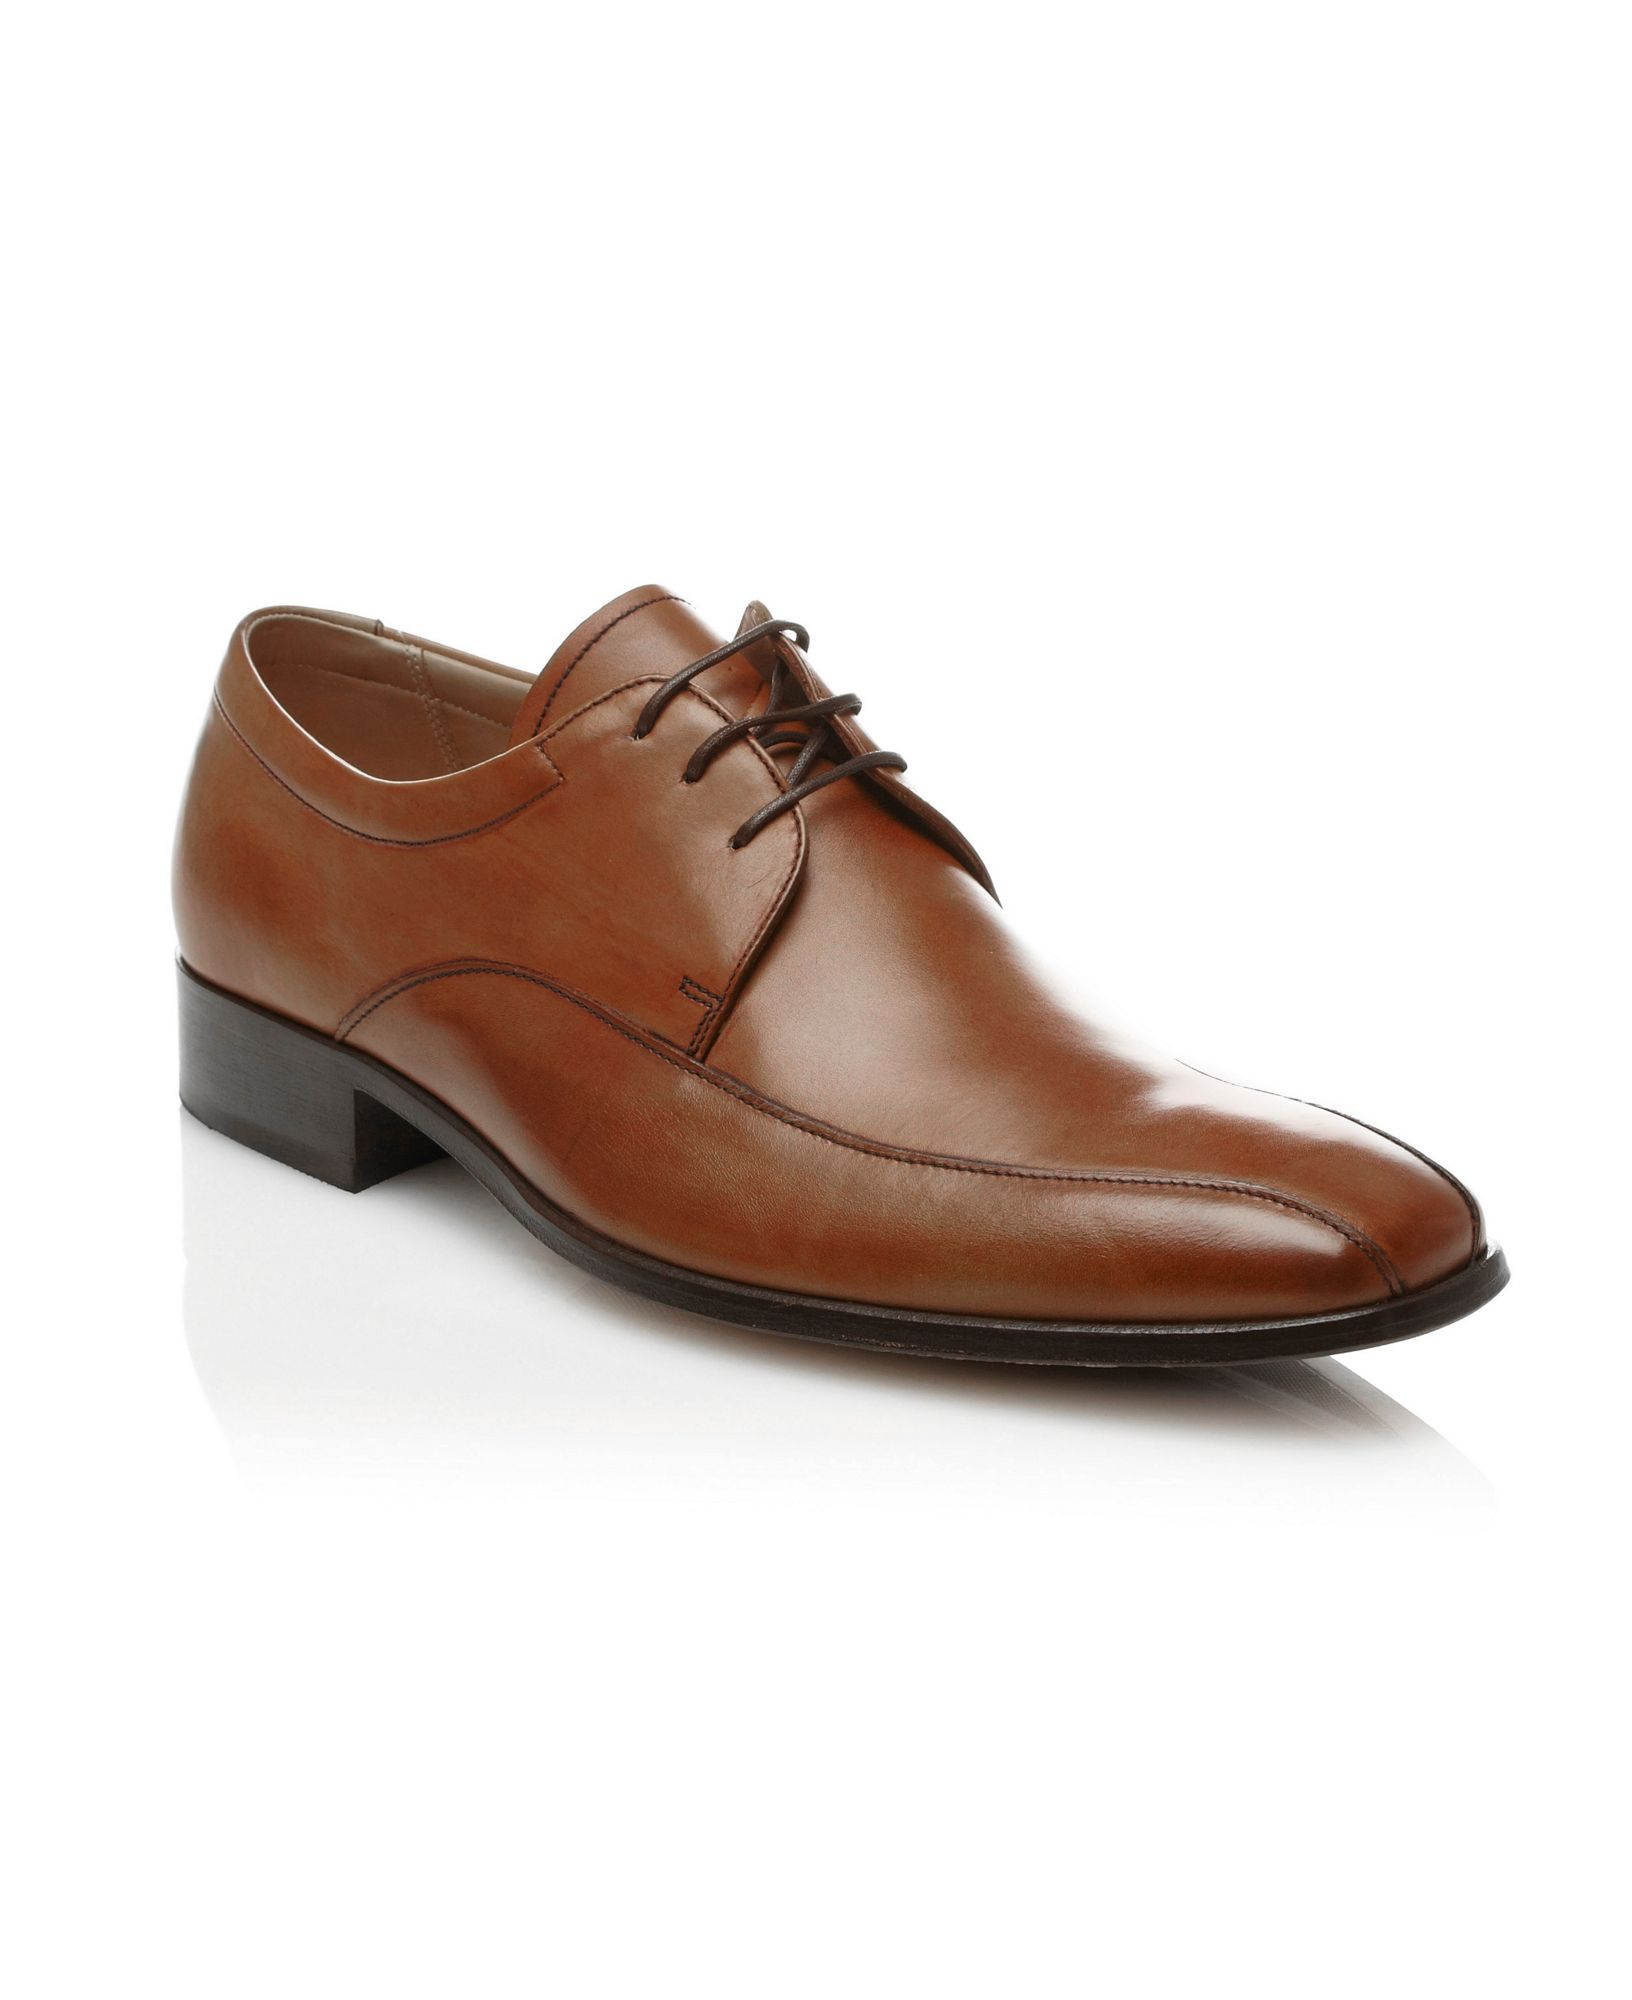 Barker Ross Shoes Sale